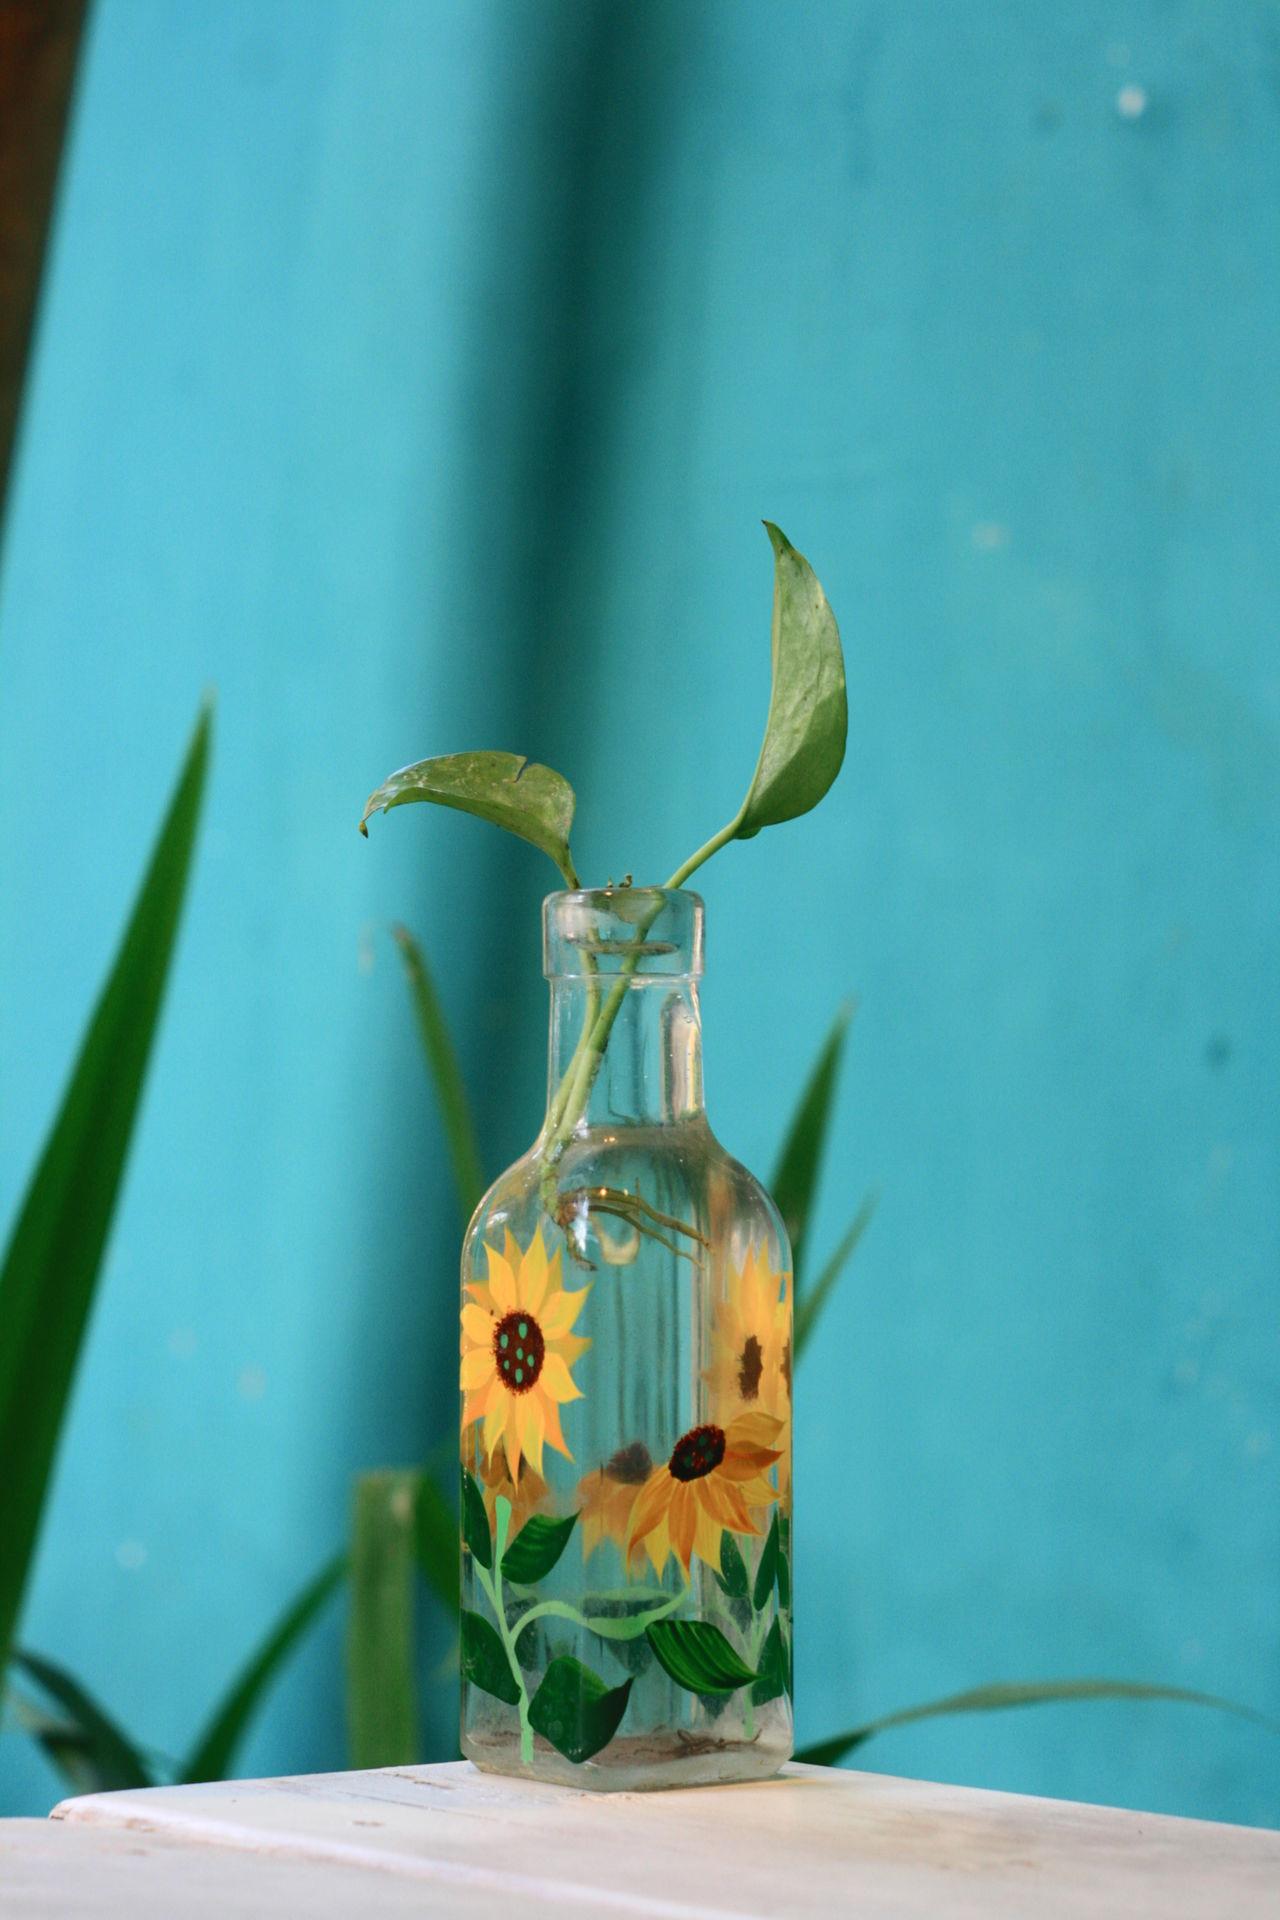 DIY vase Blue Close-up Day DIY DIY Stuff Flower Flower Head Fragility Freshness Green Color Growth Indoors  Leaf Nature No People Plant Potted Plant Sunflower Table Vase